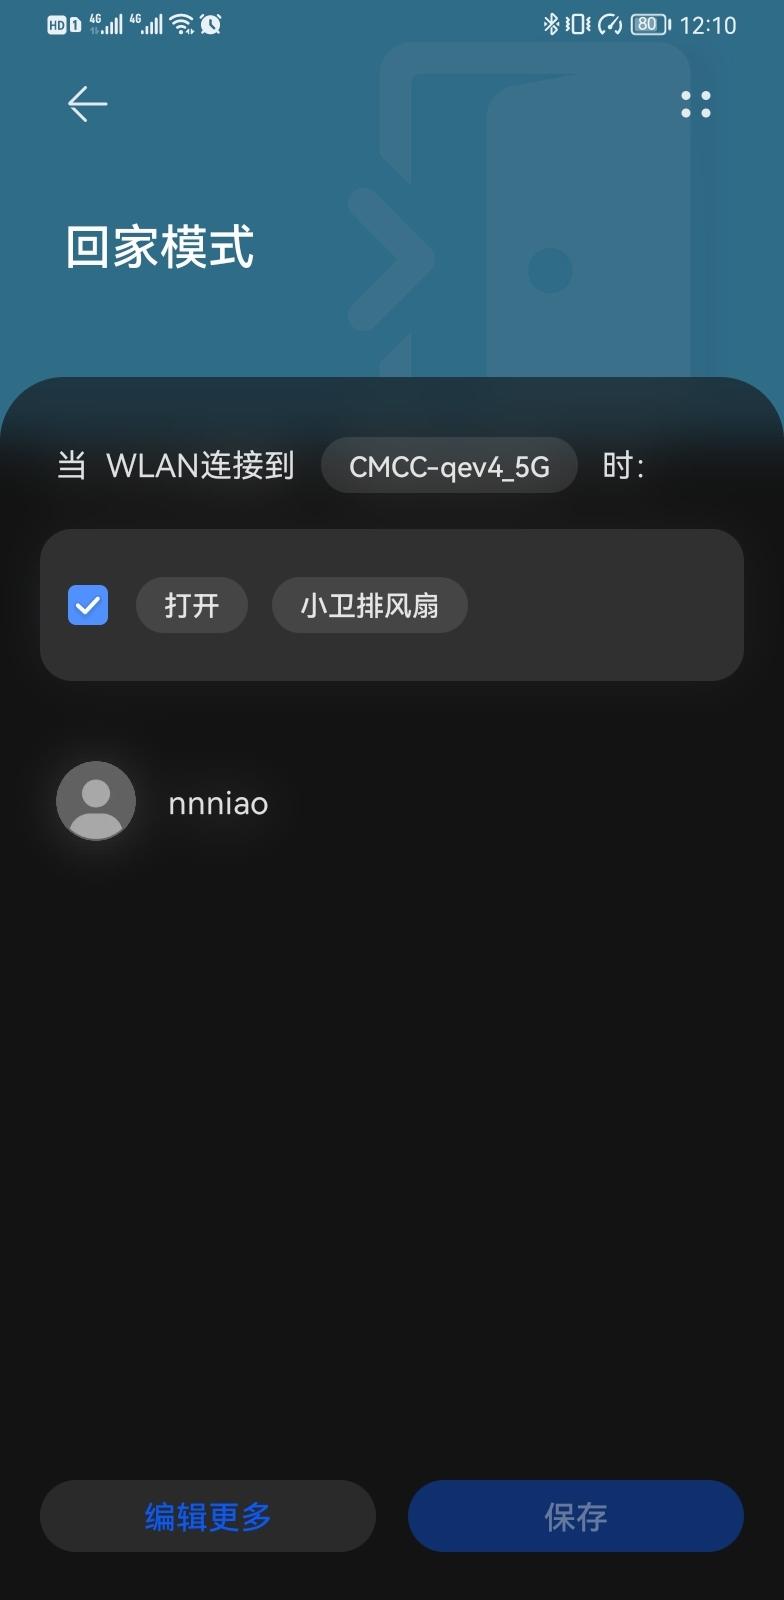 Screenshot_20210703_121054_com.huawei.smarthome.jpg